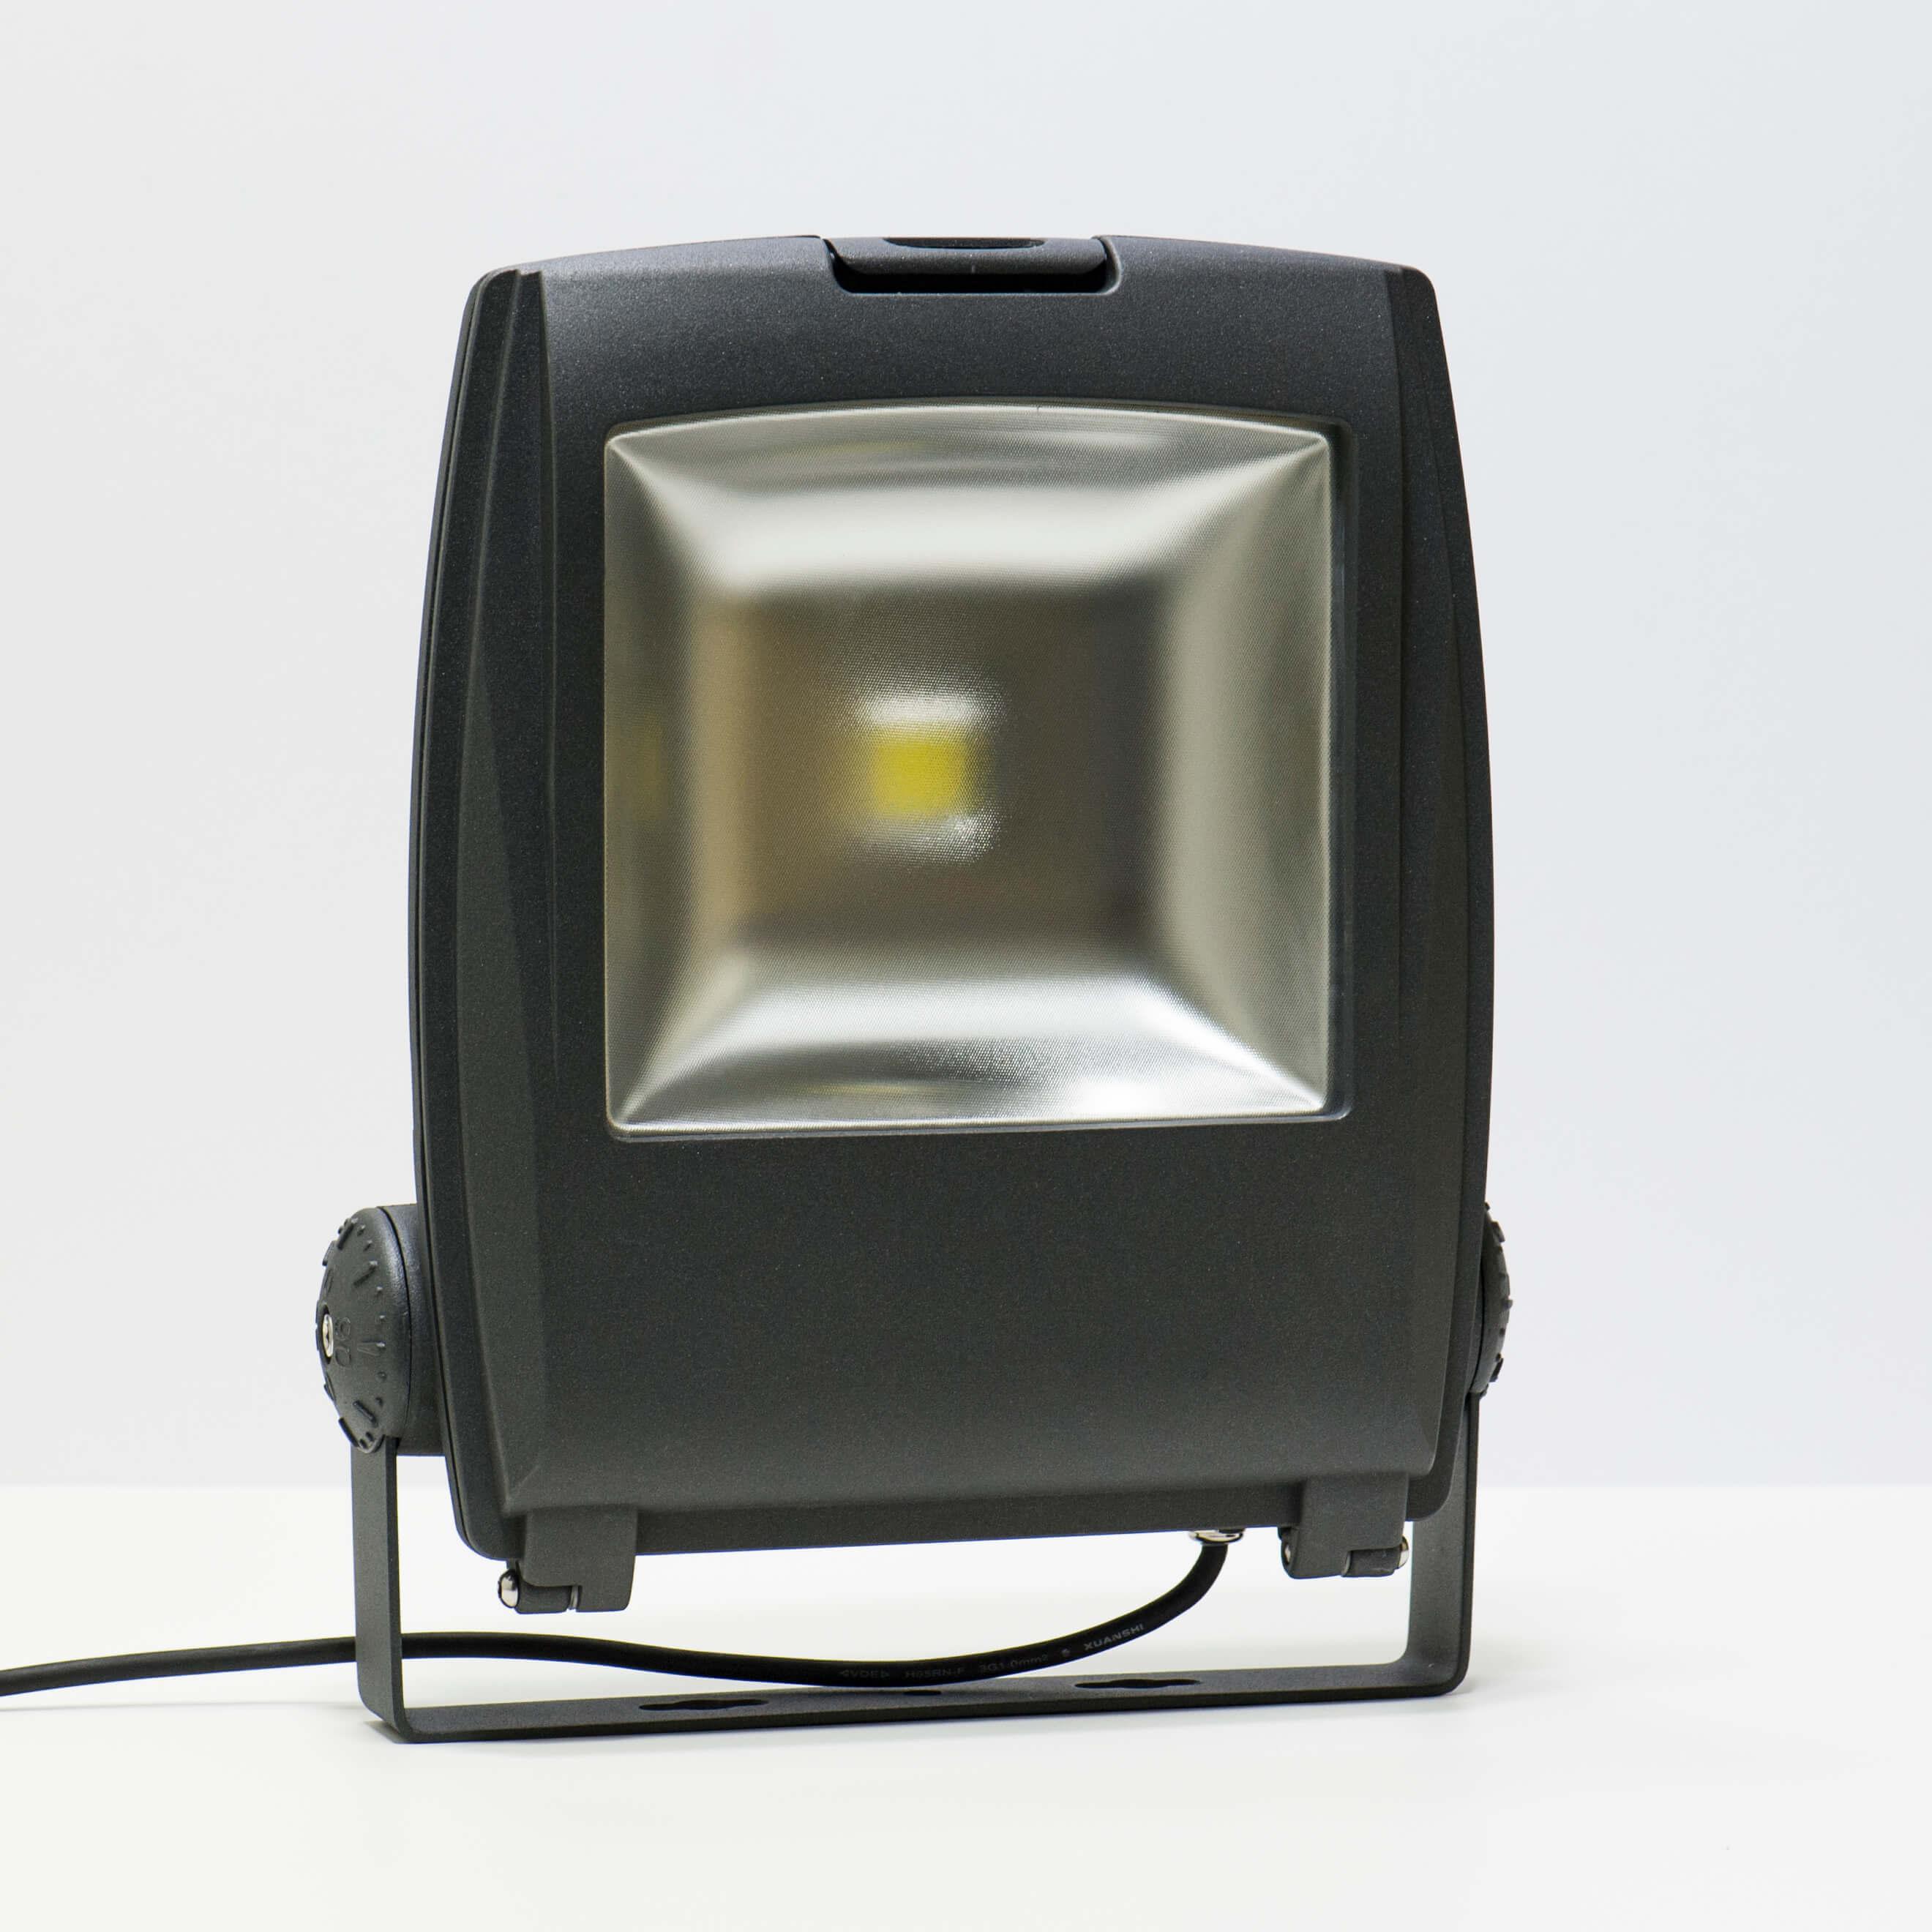 Prolumia Floodlight LED Verlichting - Steutel Installatietechniek